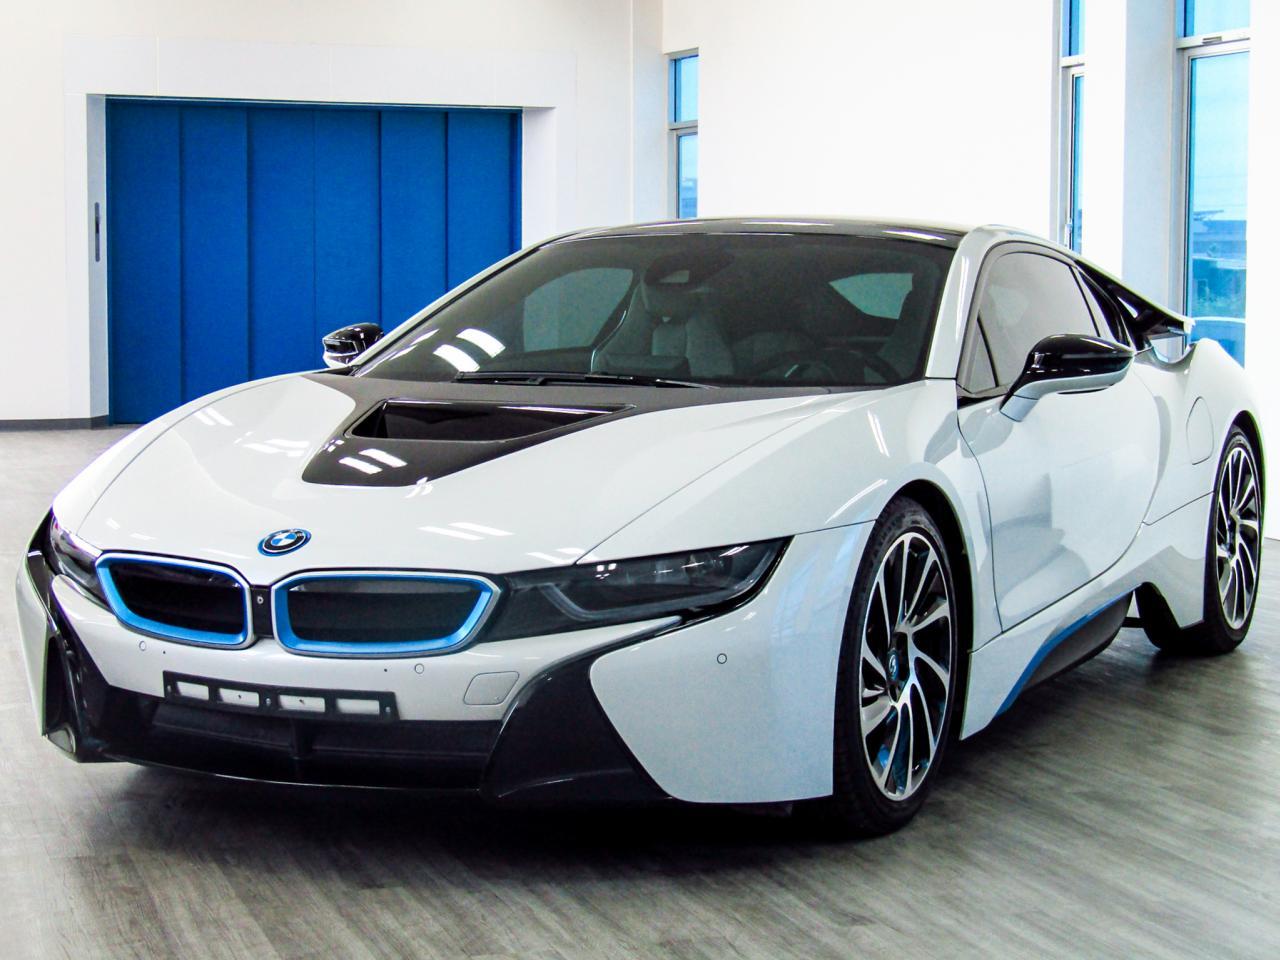 BMW I8 I12 (ปี14-17) Hybrid 1.5 eDrive AT ปี 2017 ราคา - (#59952KD1401)